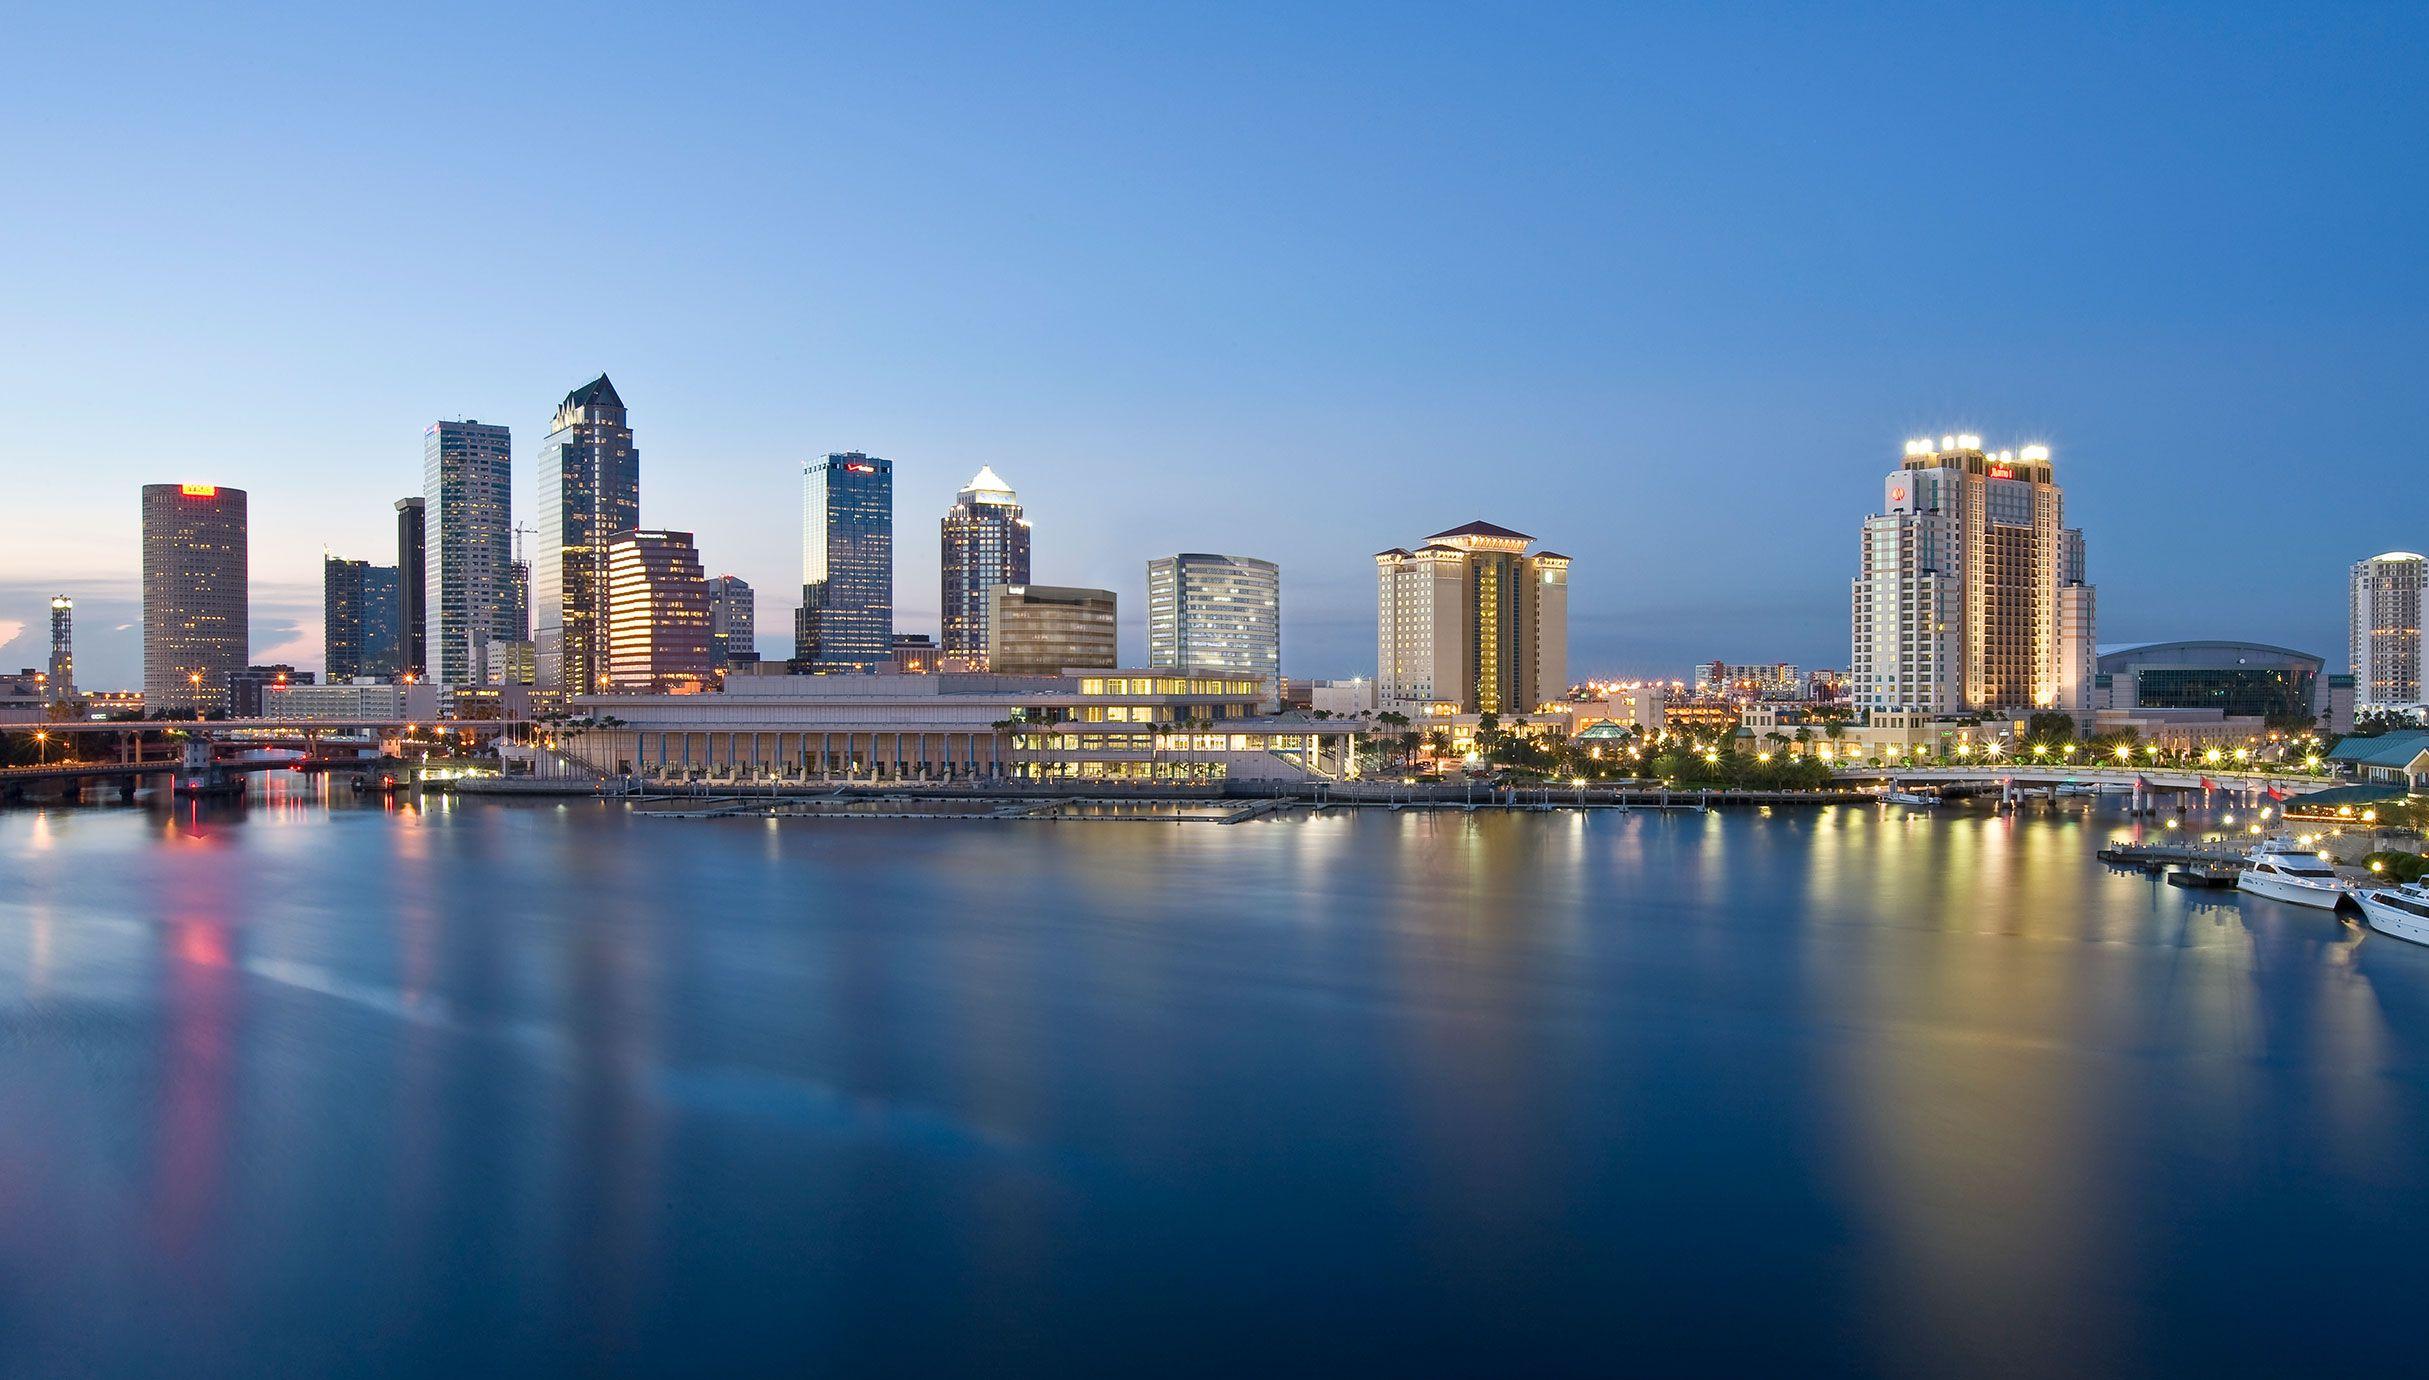 Best Vegan Restaurants In Tampa Fl Vegan Food Lover Best Places In Florida Visit Chicago Visit Florida